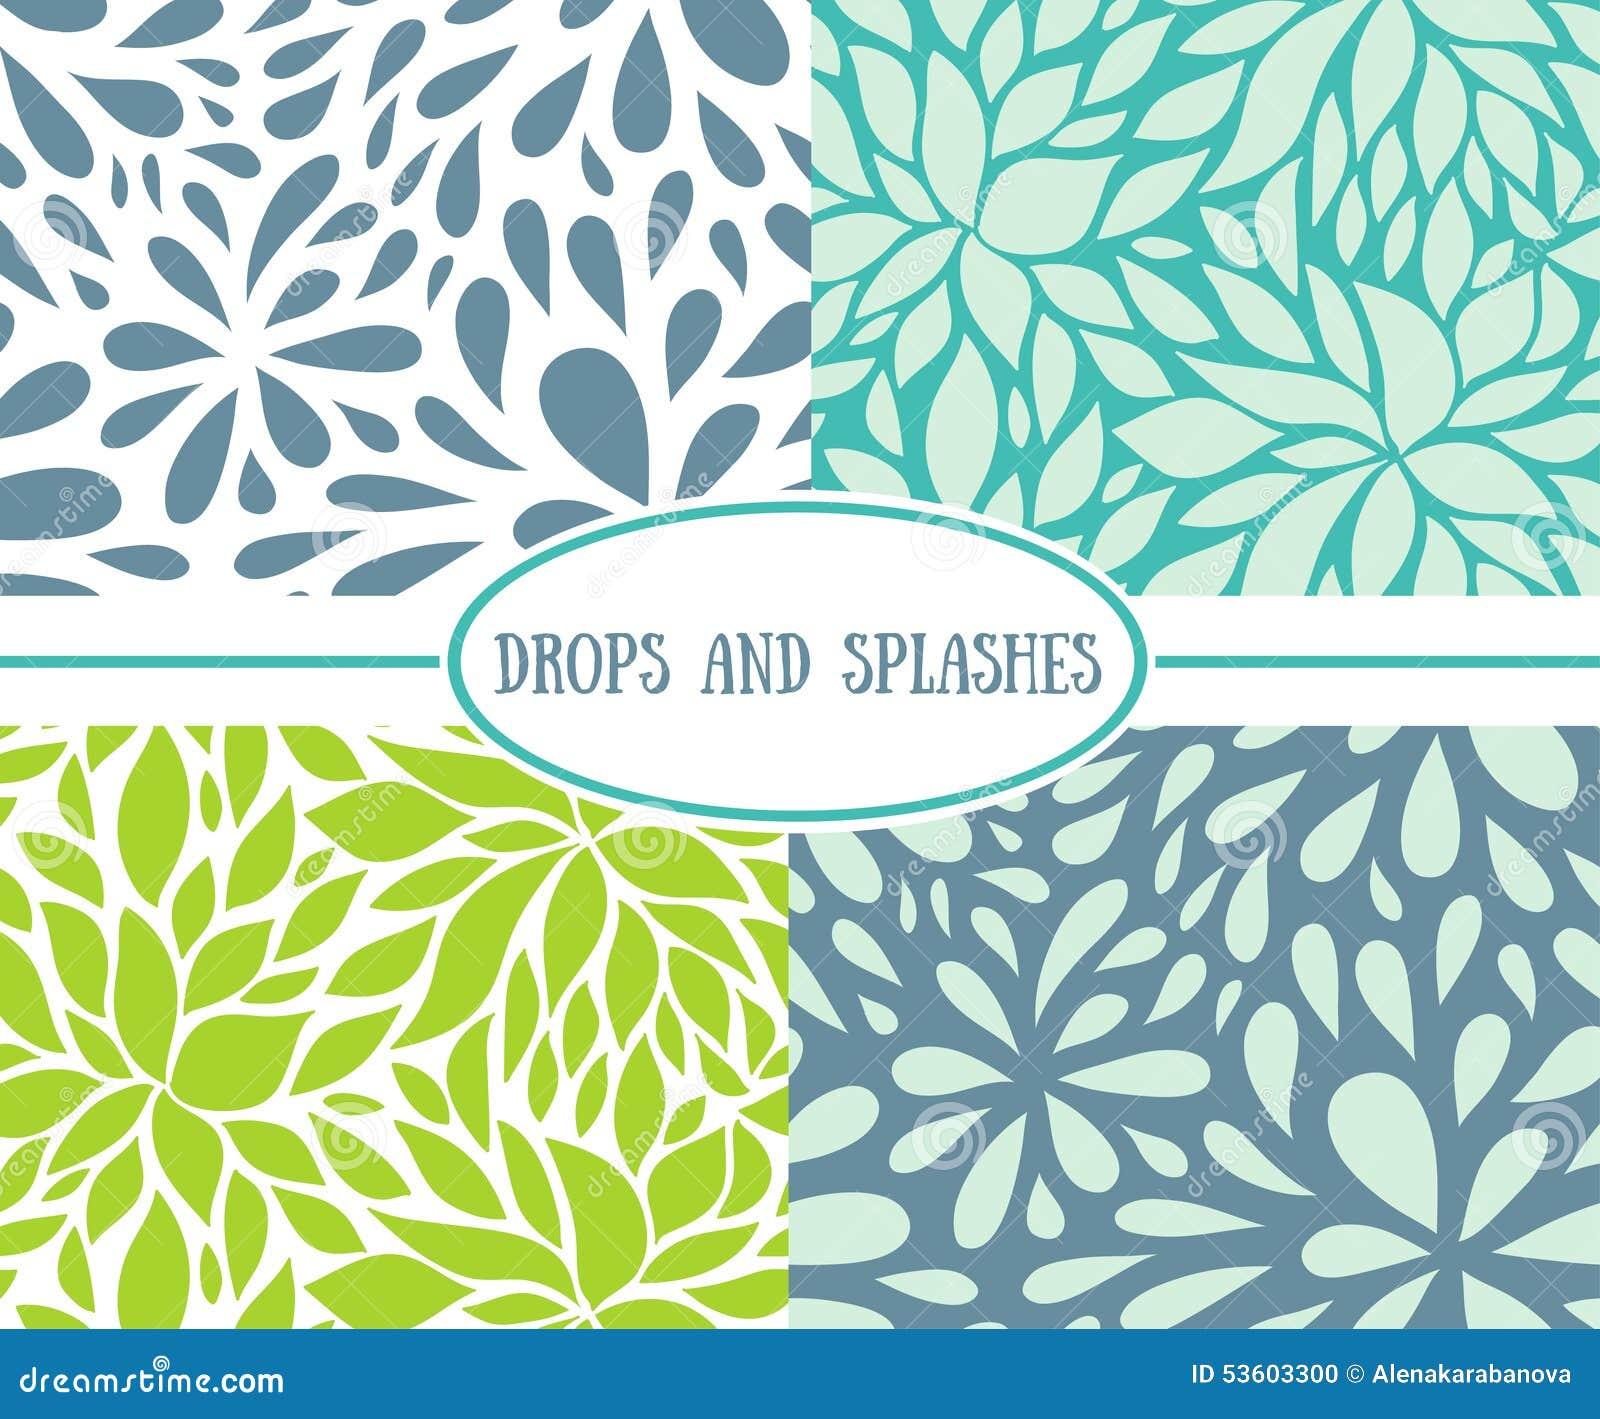 Drops Patterns Simple Inspiration Ideas